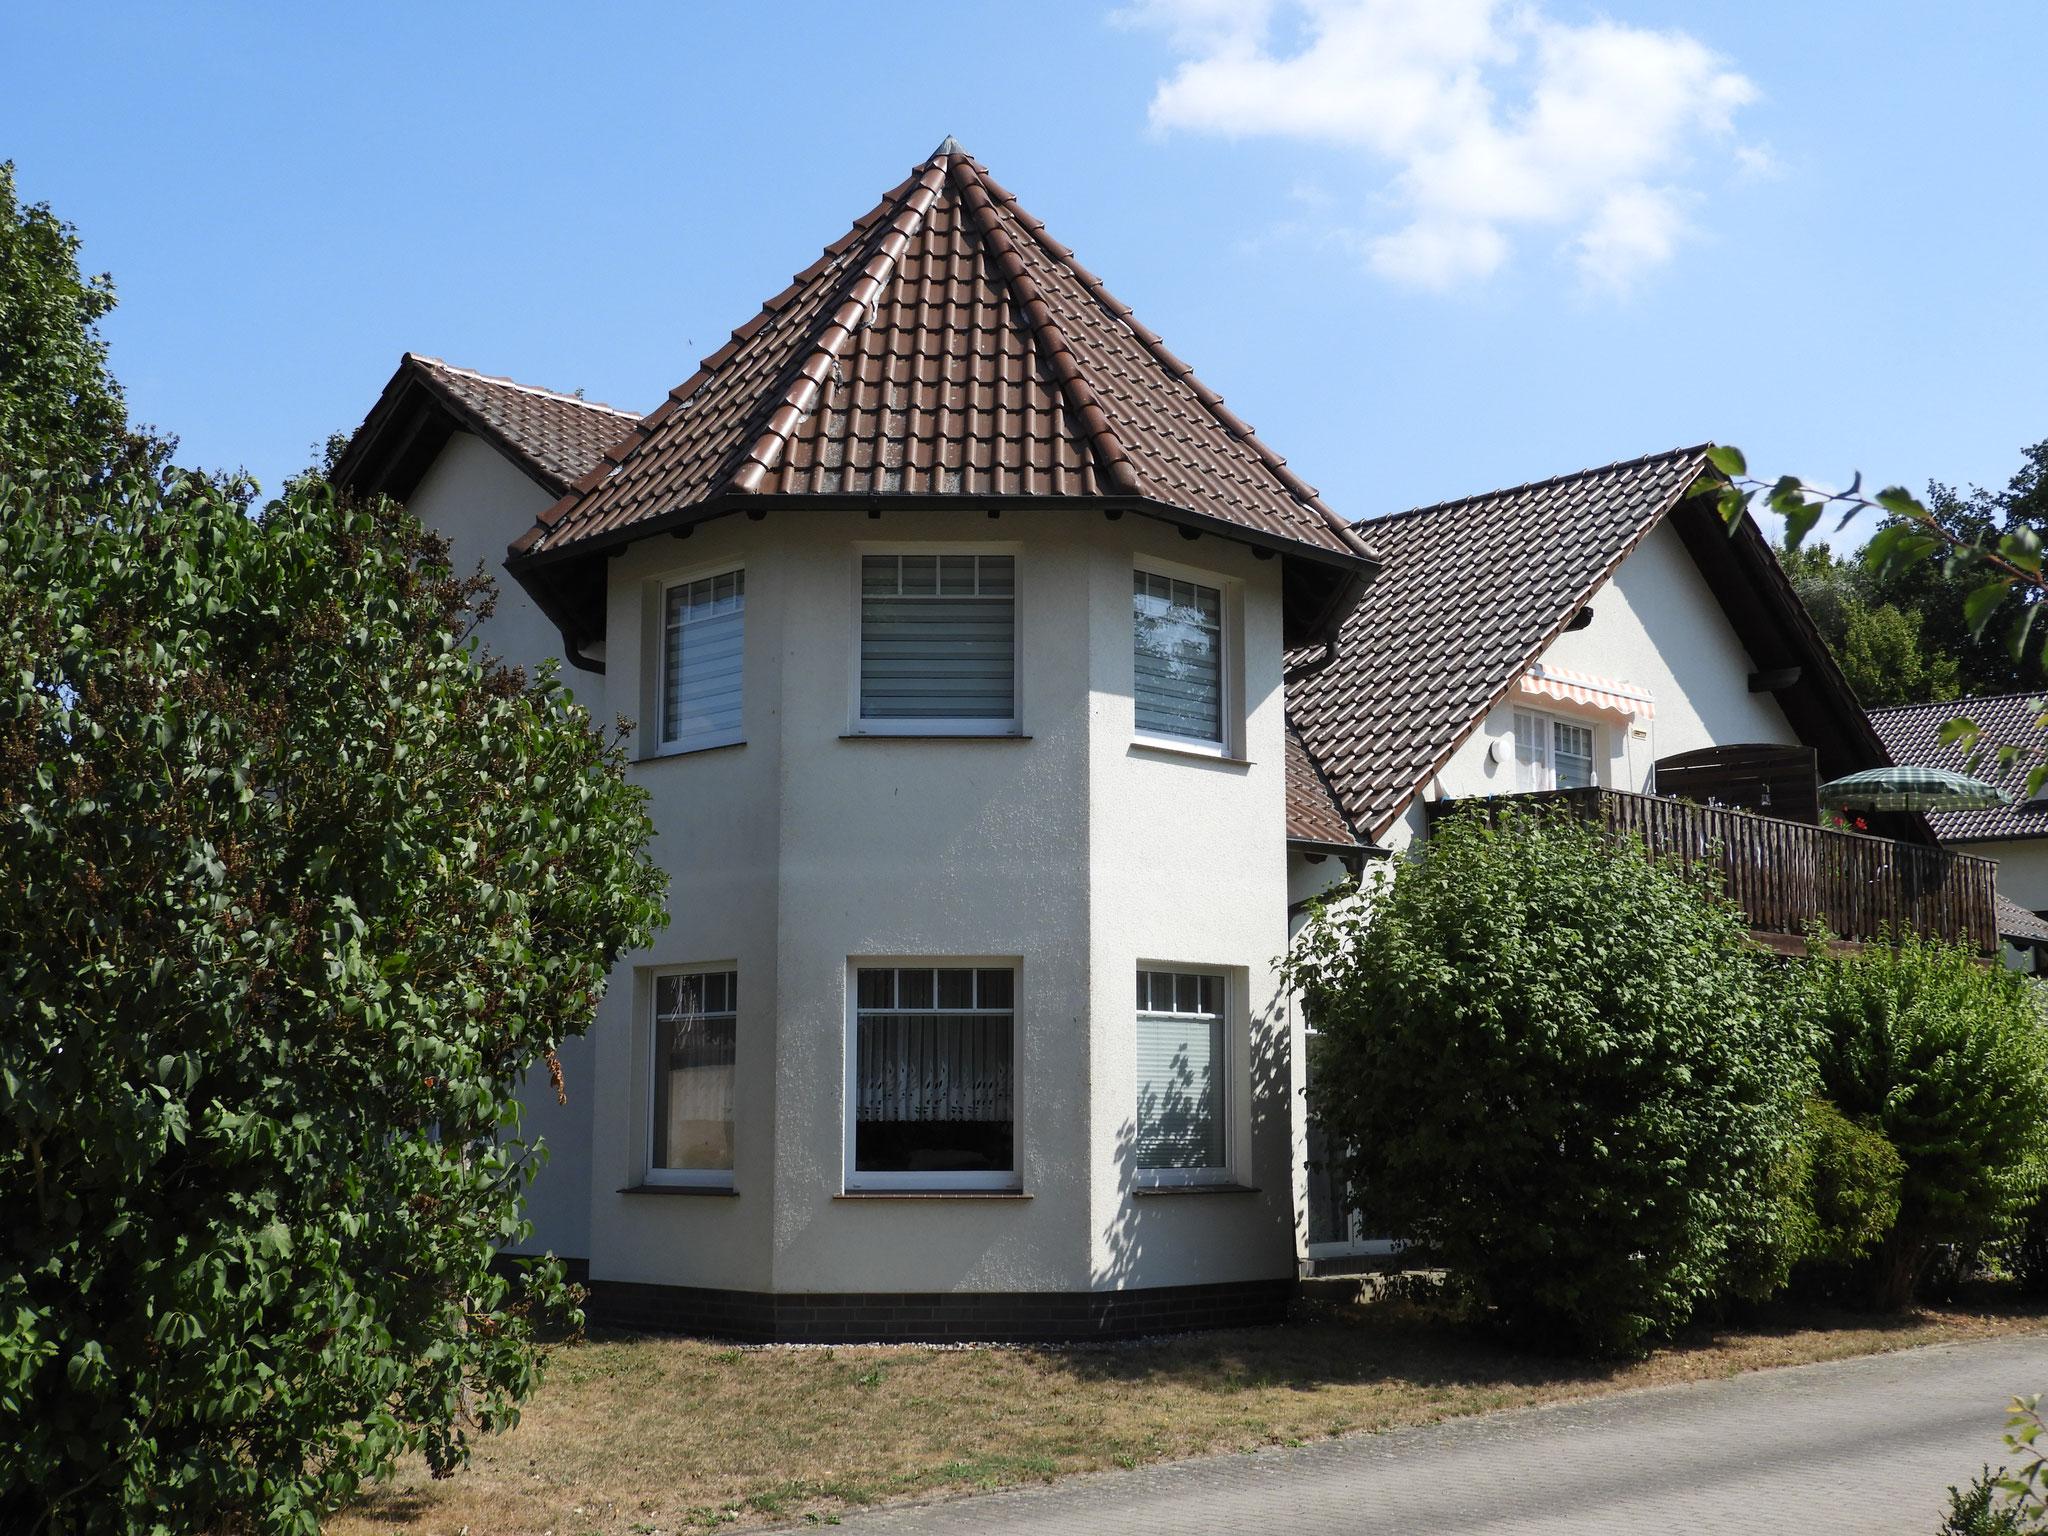 Stadtvilla in Altentreptow